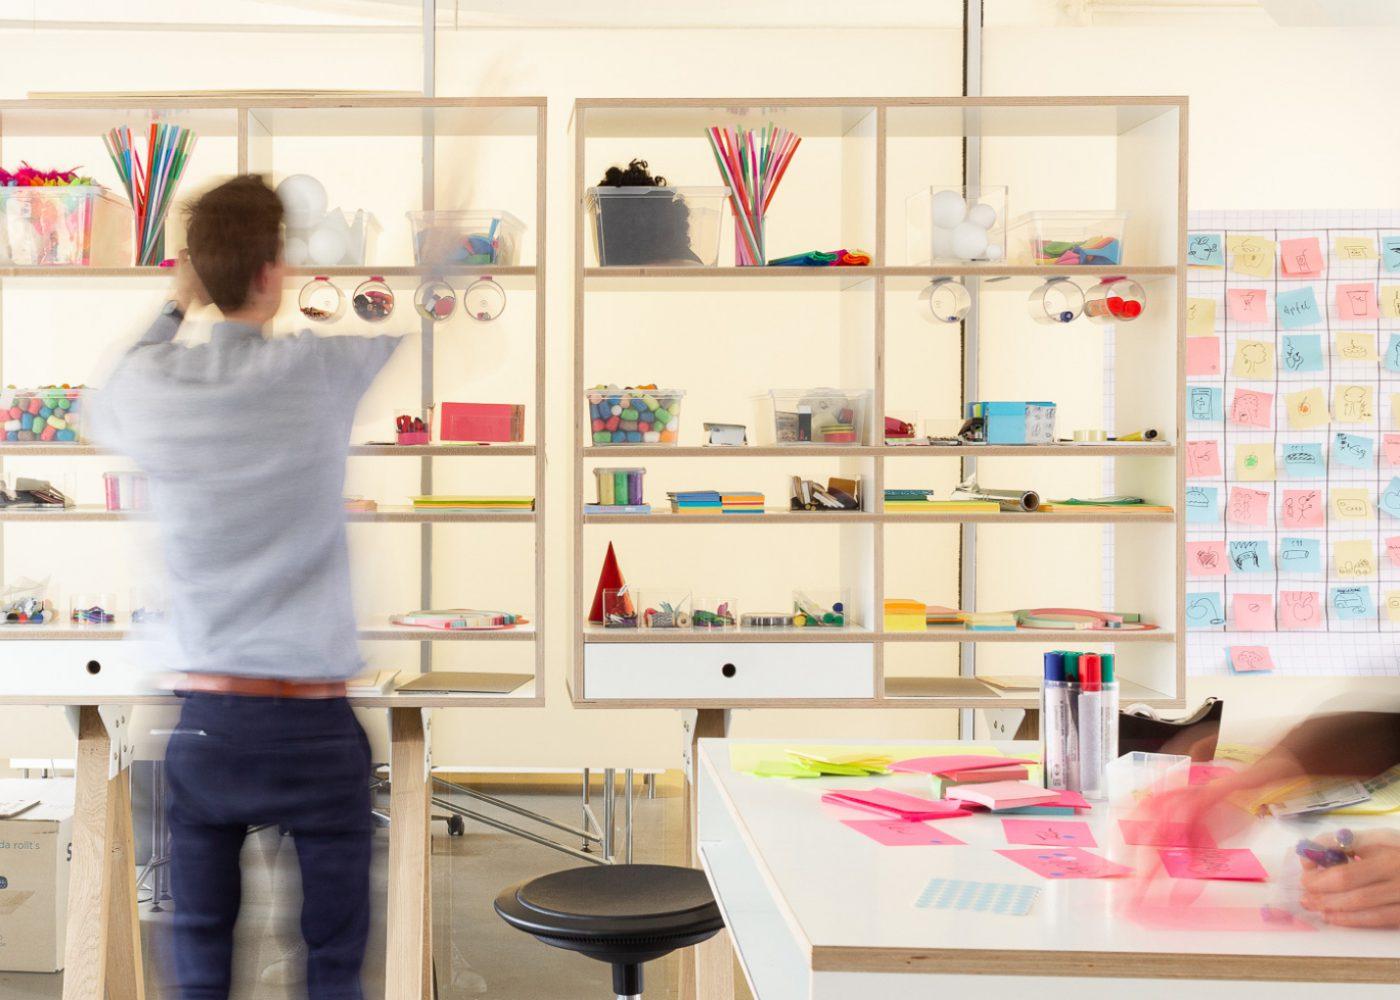 Helder Designstudio in Kreuzberg – Workshopraum